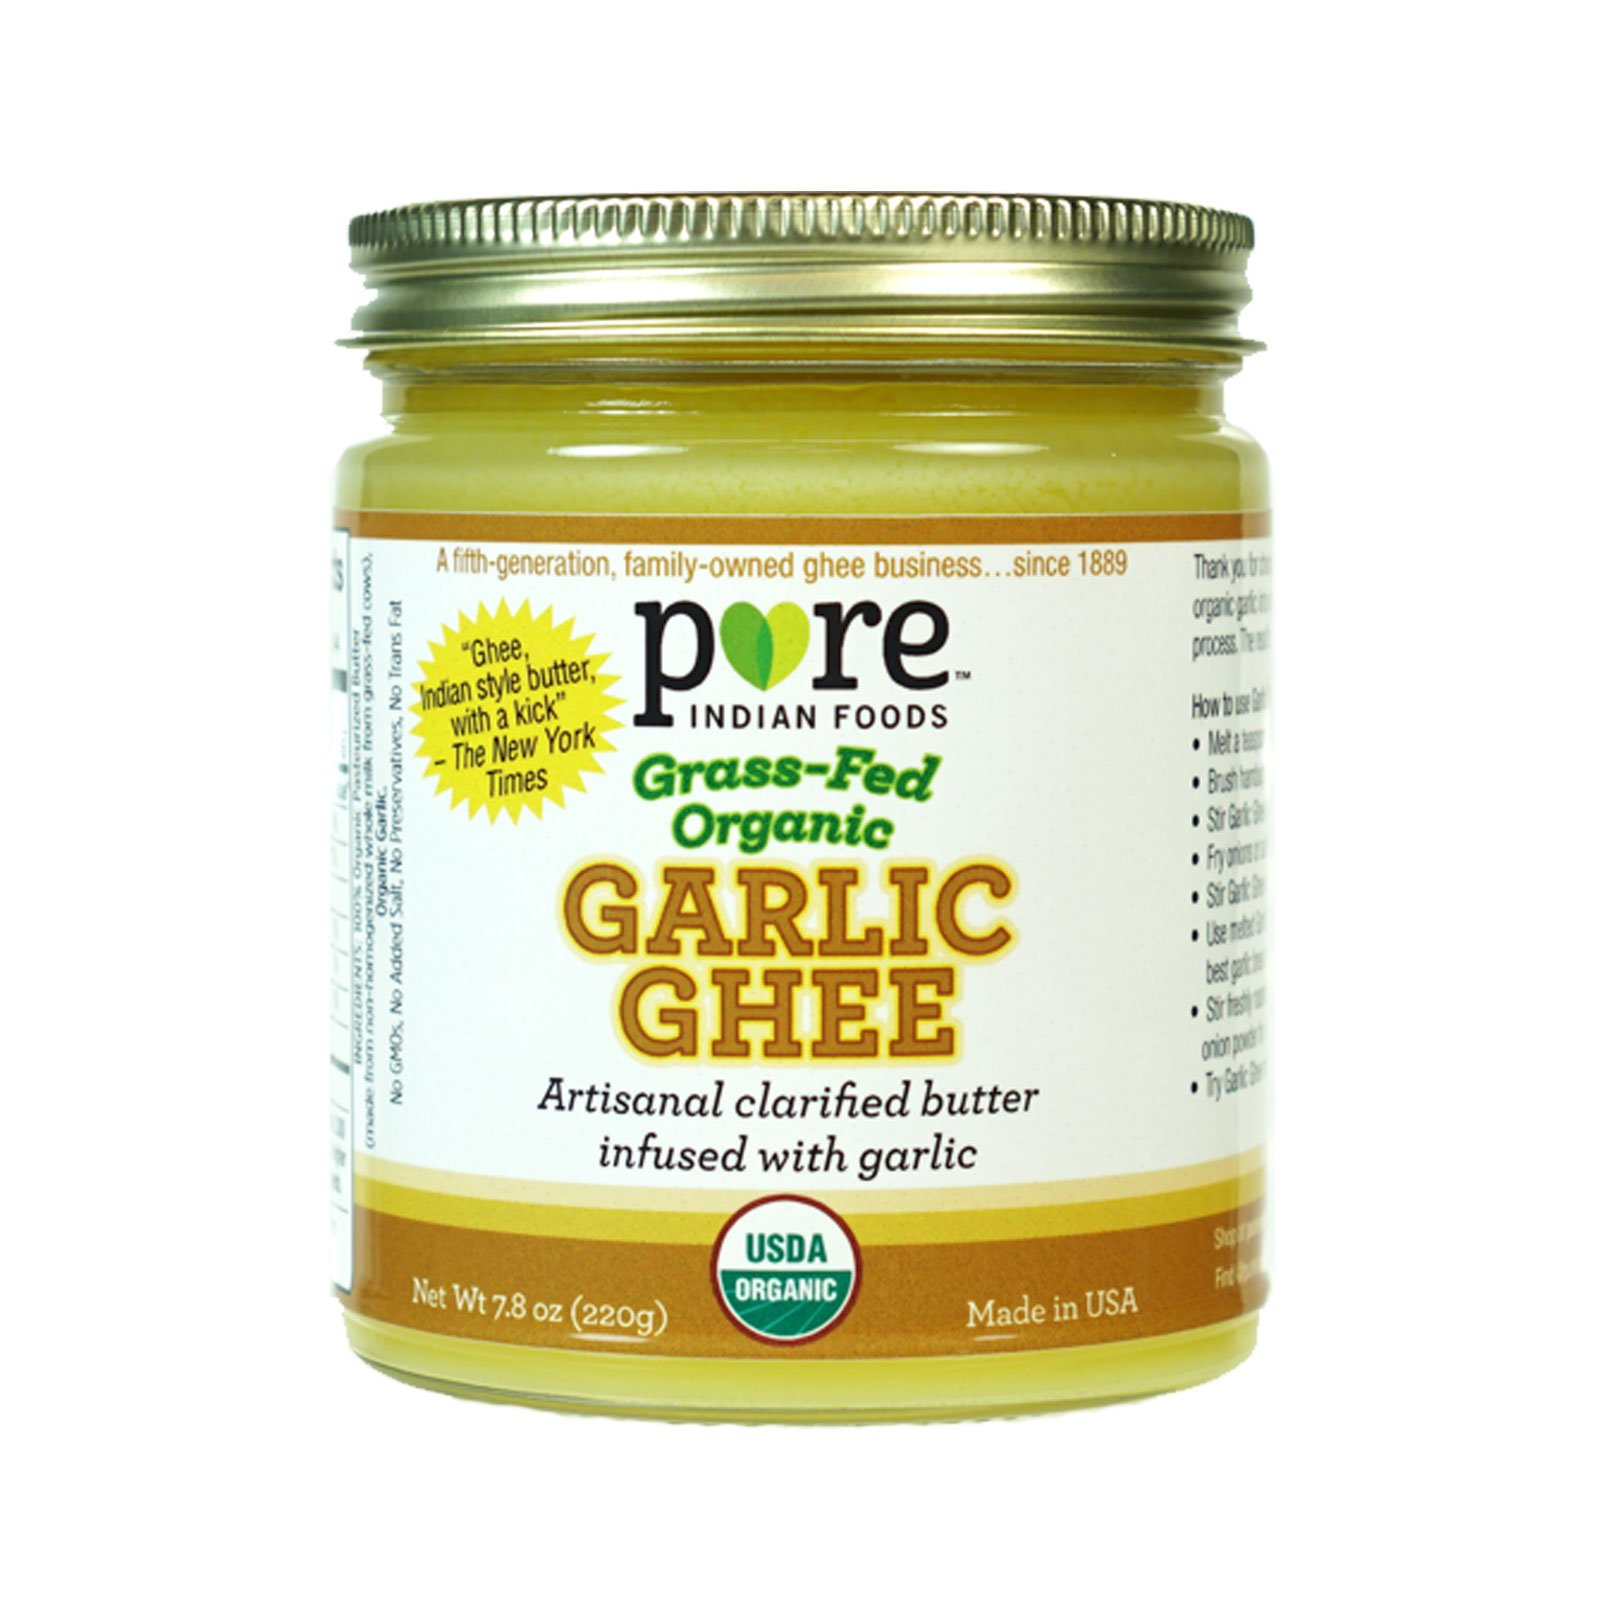 Garlic Ghee 7.8 oz, Grassfed & Certified Organic